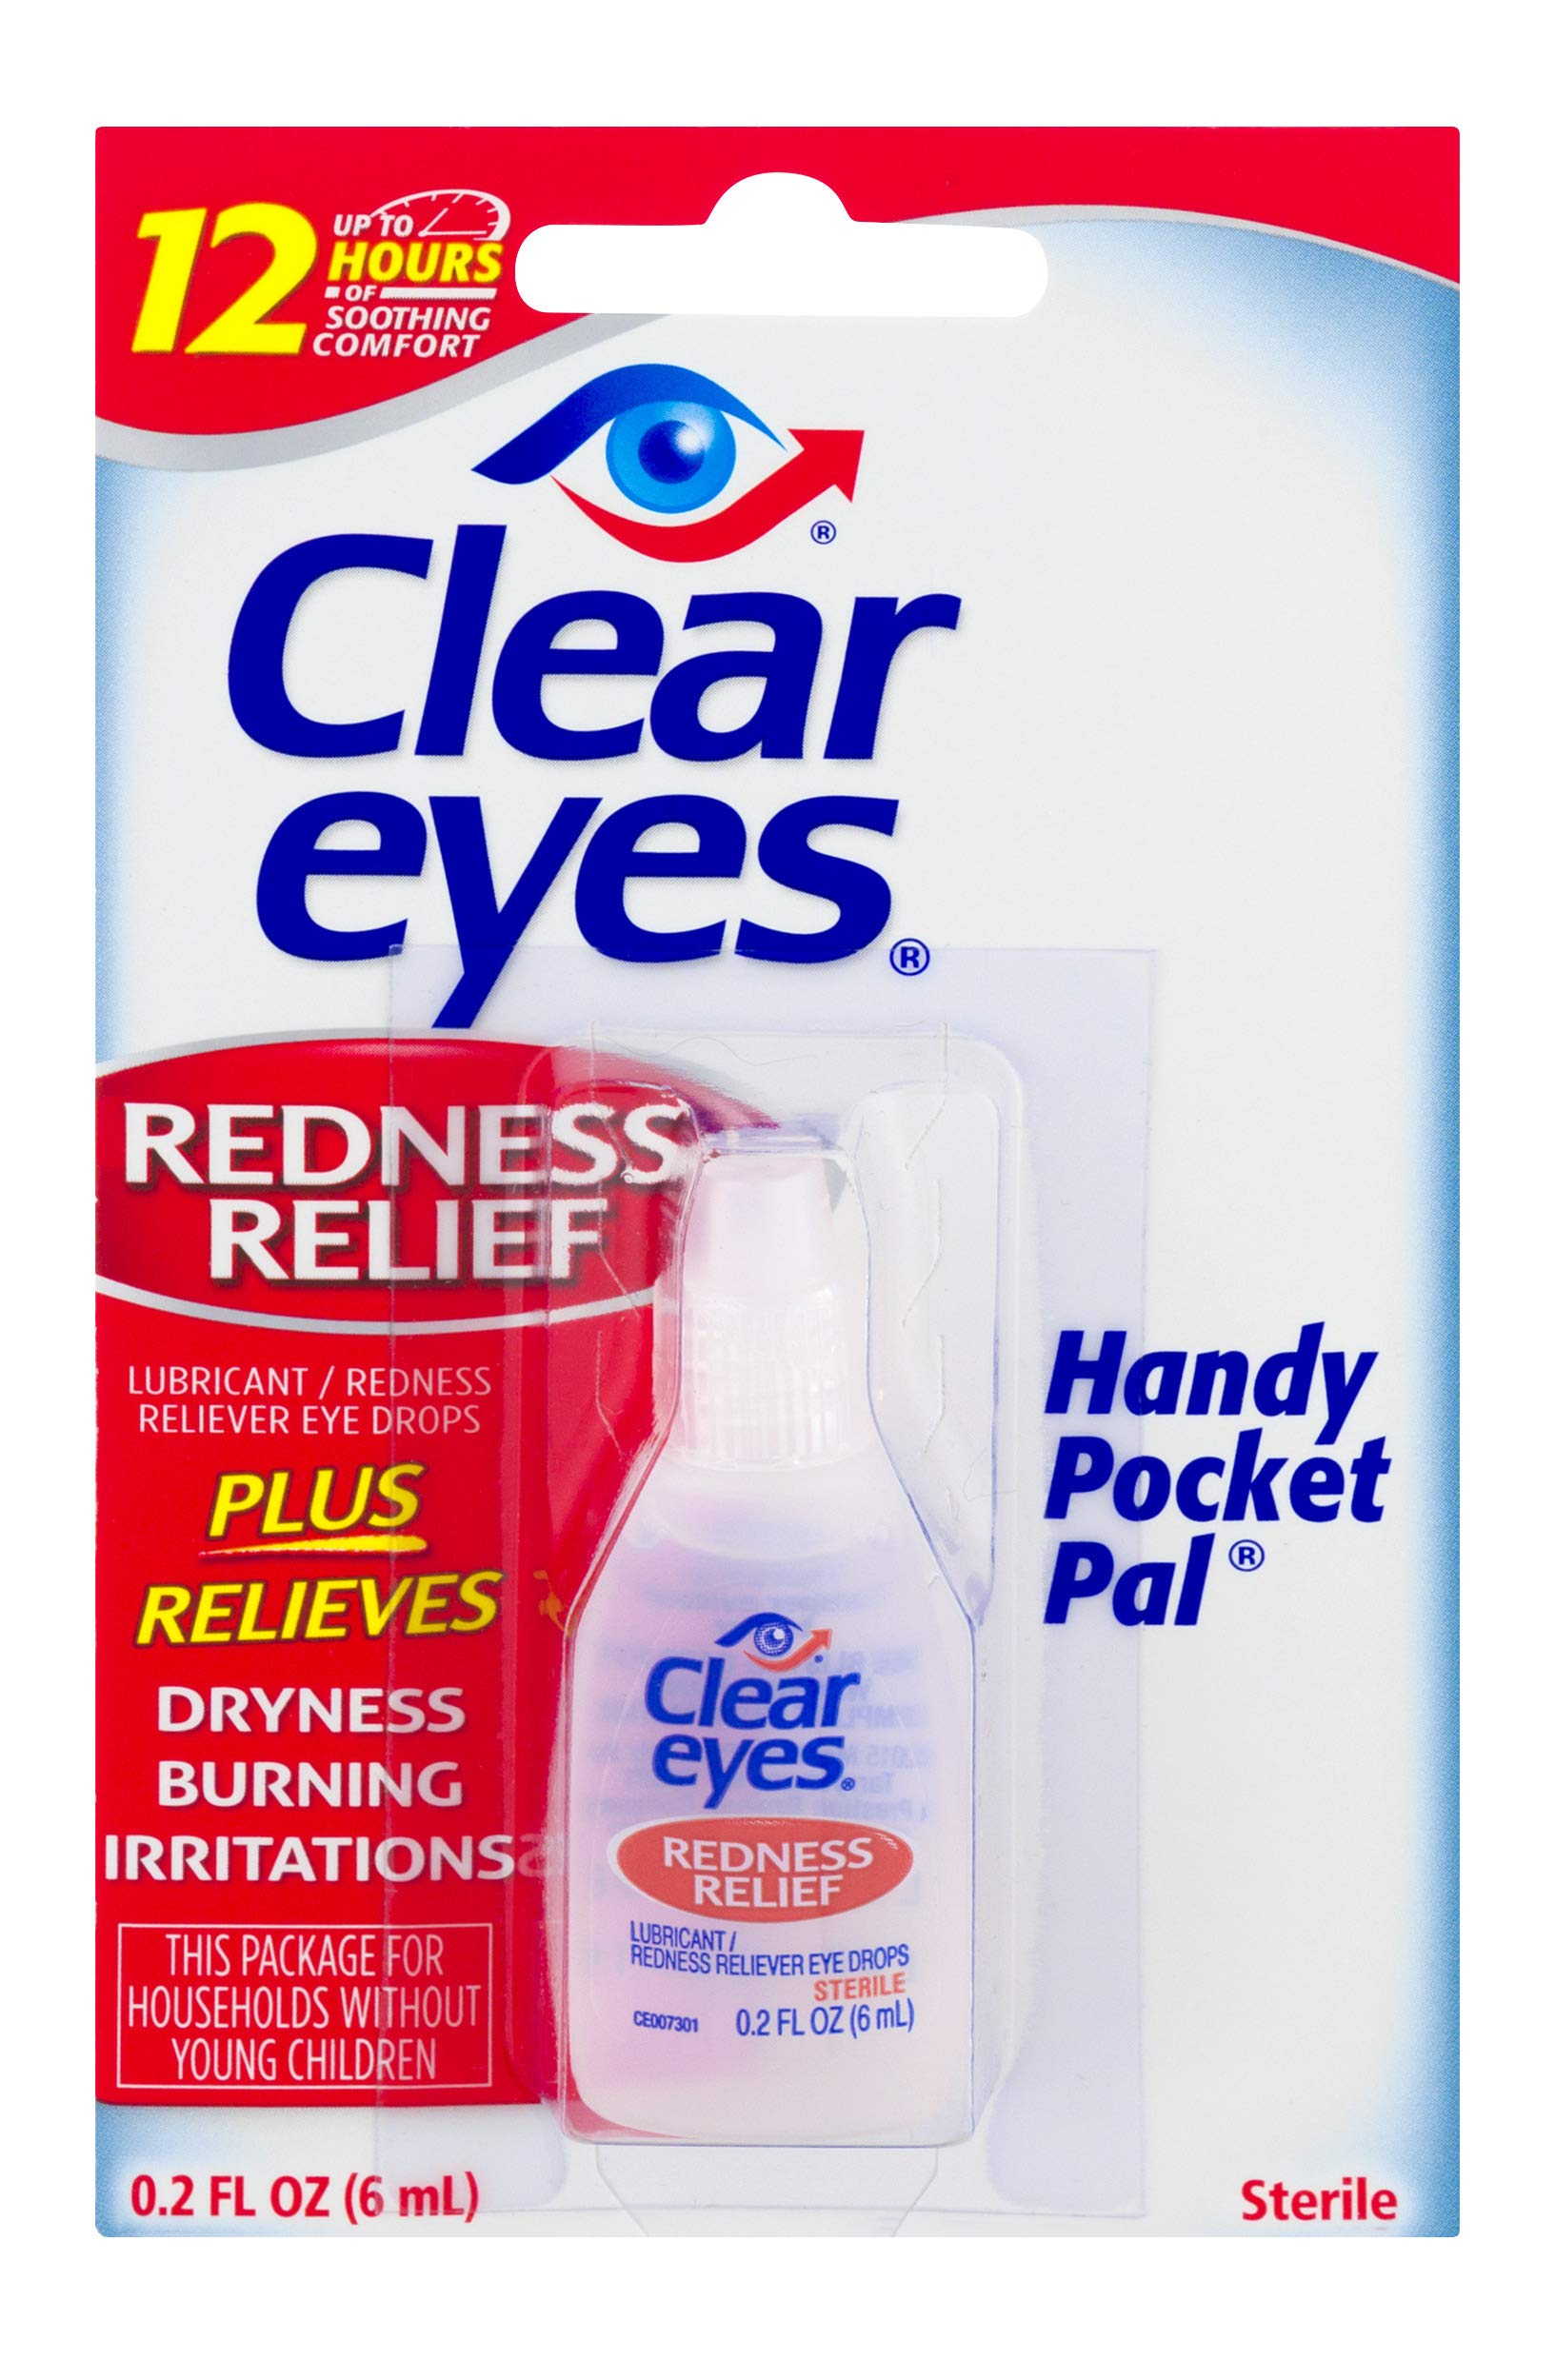 Clear Eyes | Handy Pocket Pal Redness Relief Eye Drops | 0.2 FL OZ